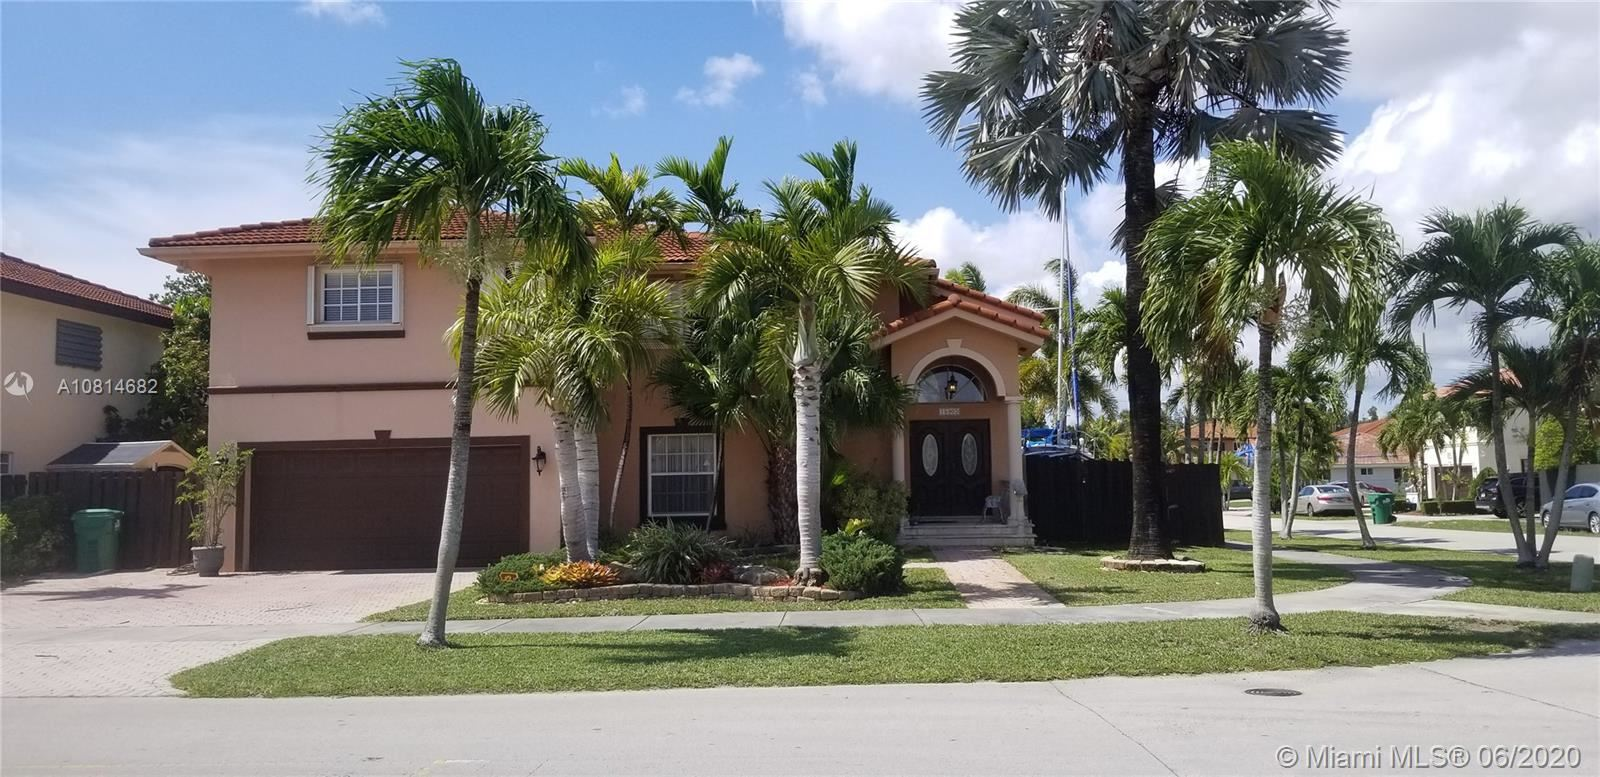 15903 SW 43rd St, Miami, FL 33185 - #: A10814682